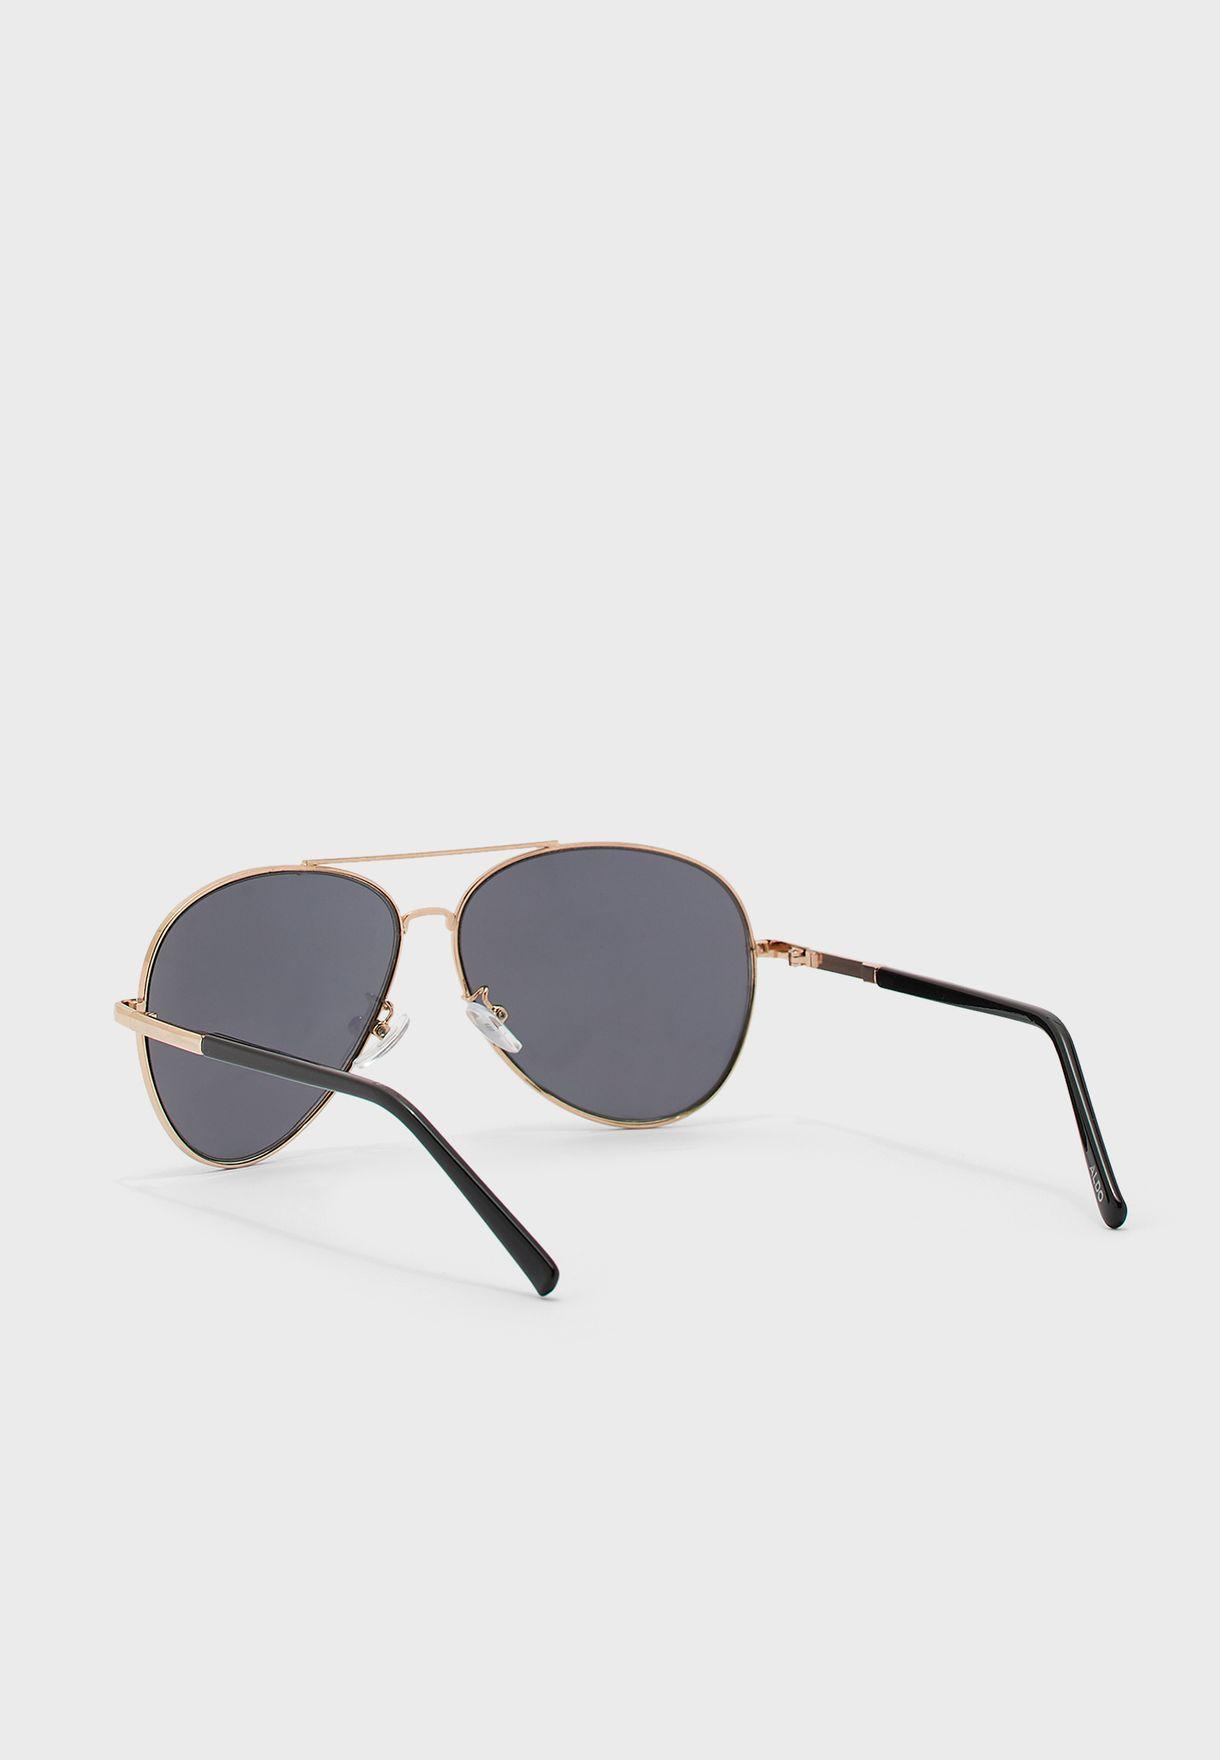 Potoroo Sunglasses